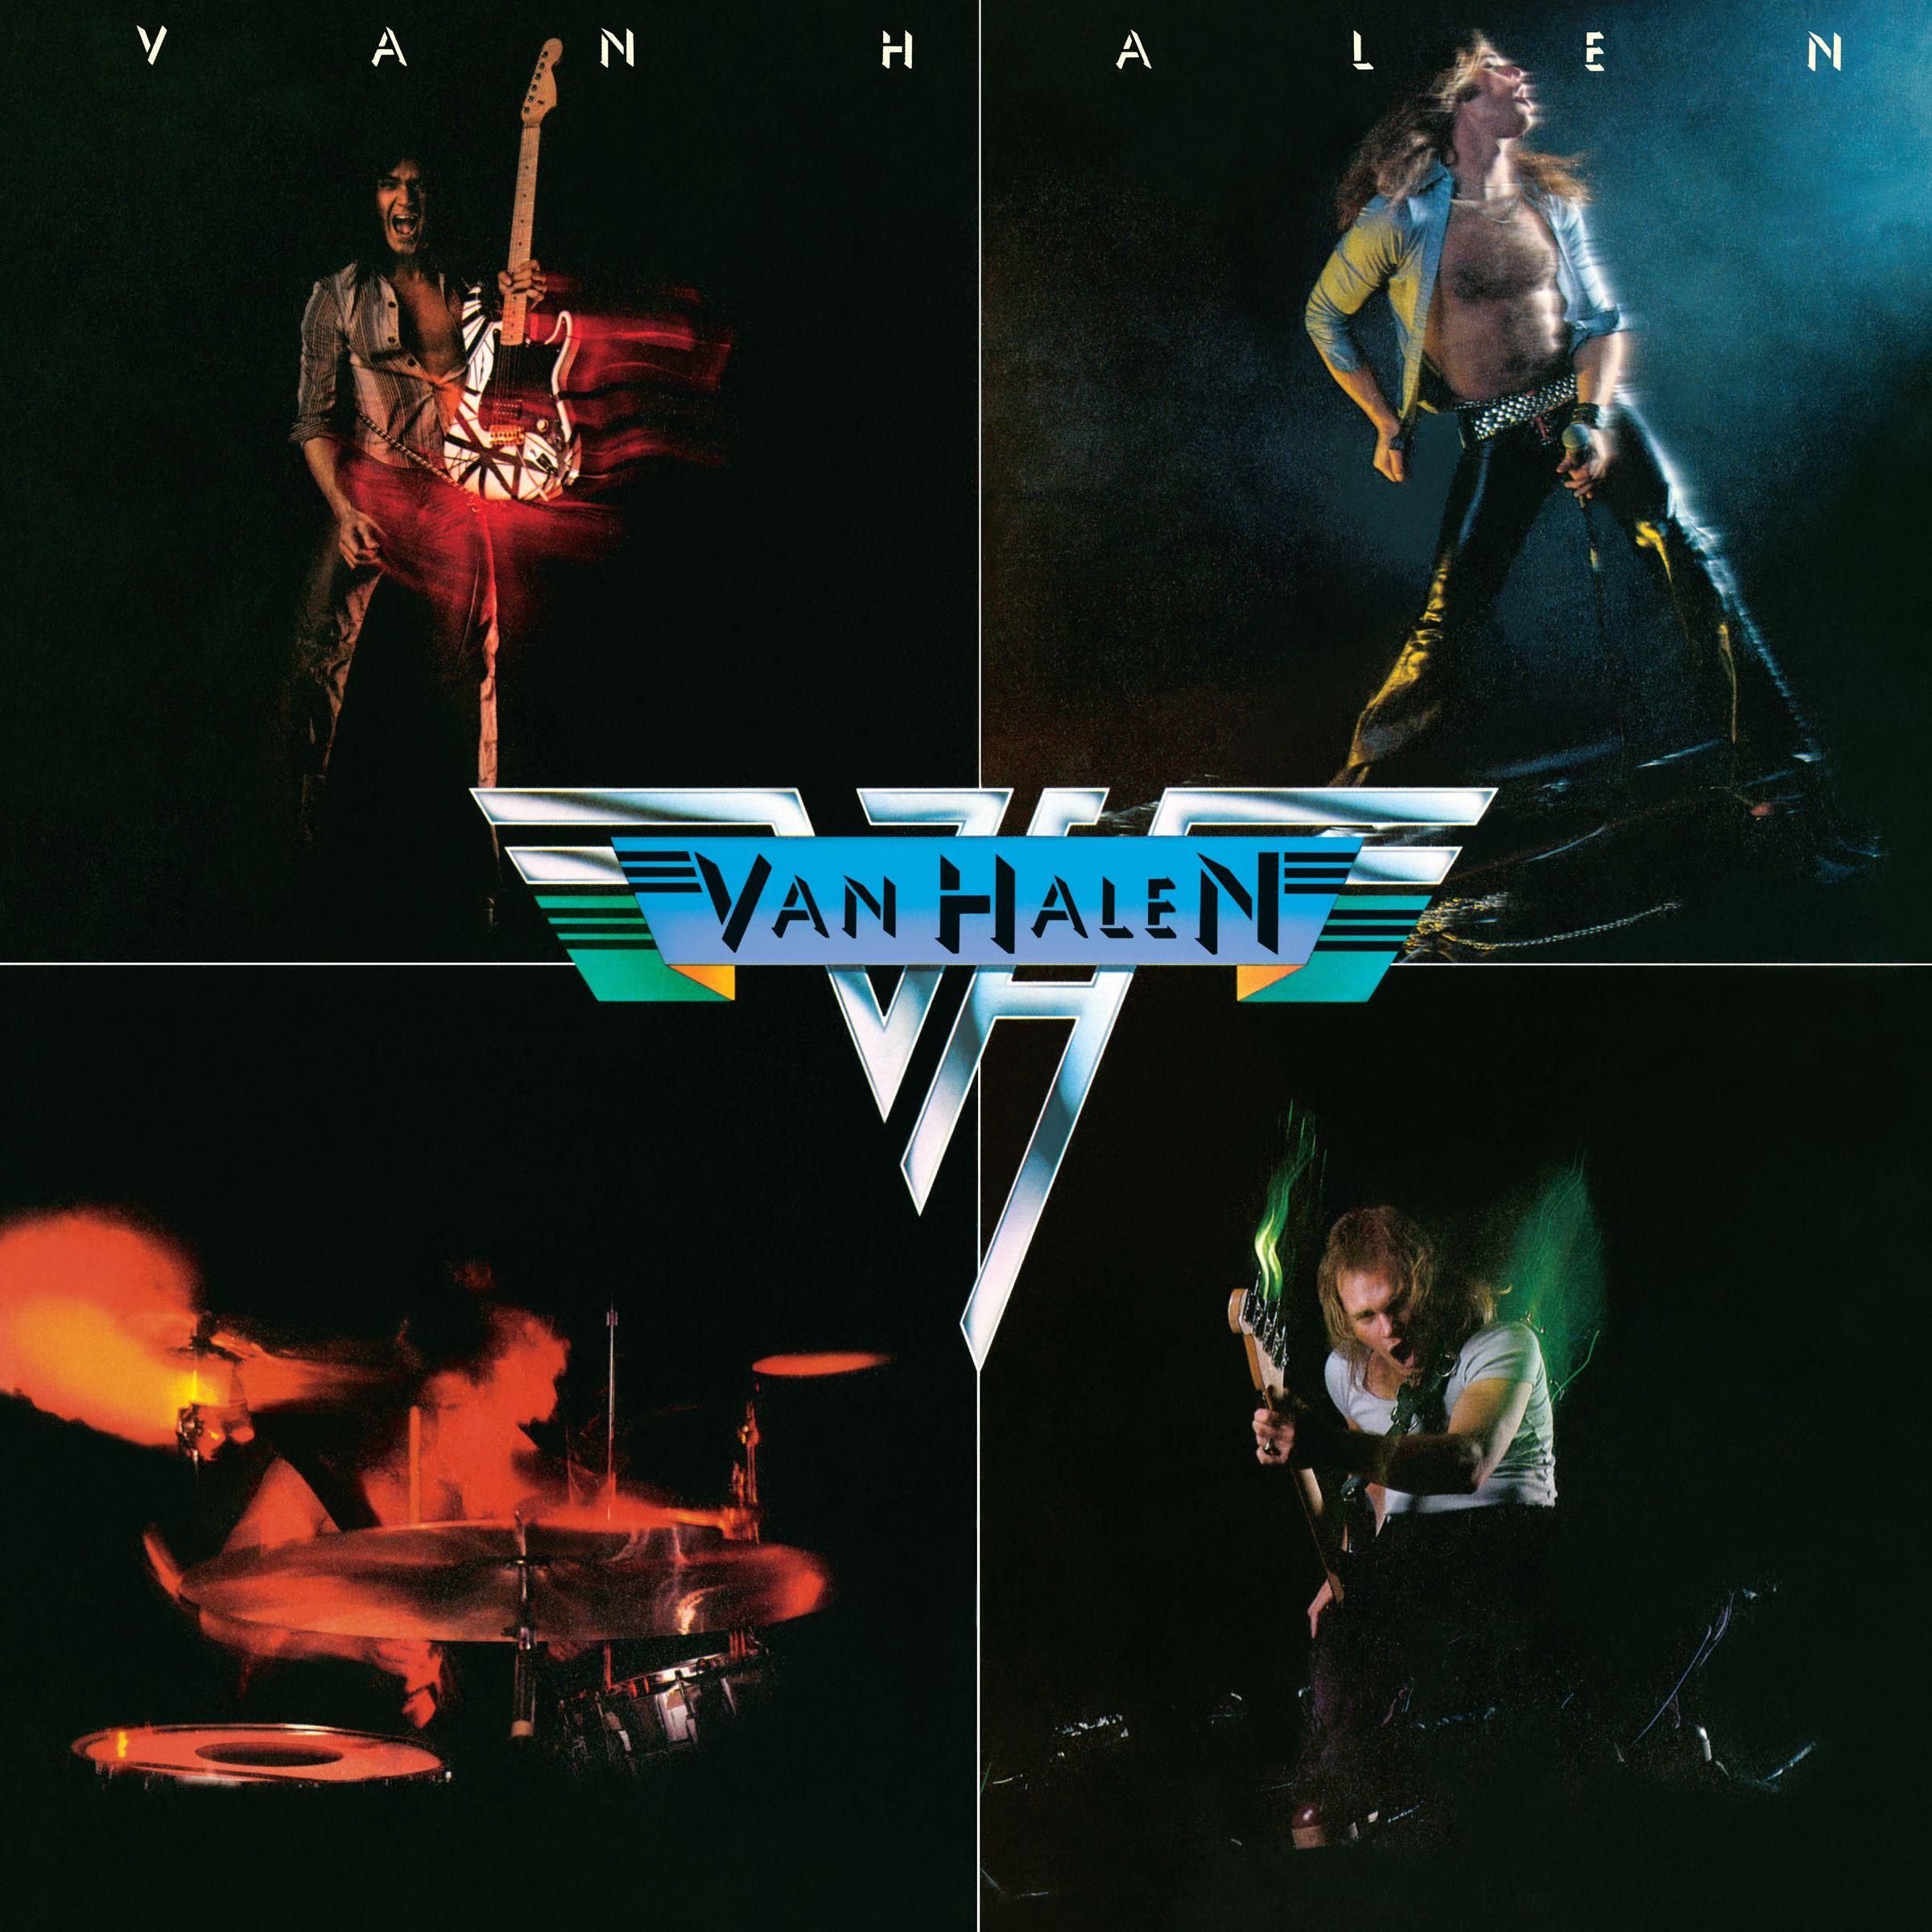 Van Halen (ヴァン・ヘイレン) 1stアルバム『Van Halen (炎の導火線)』(1978年2月10日発売) 高画質CDジャケット画像 (ジャケ写)